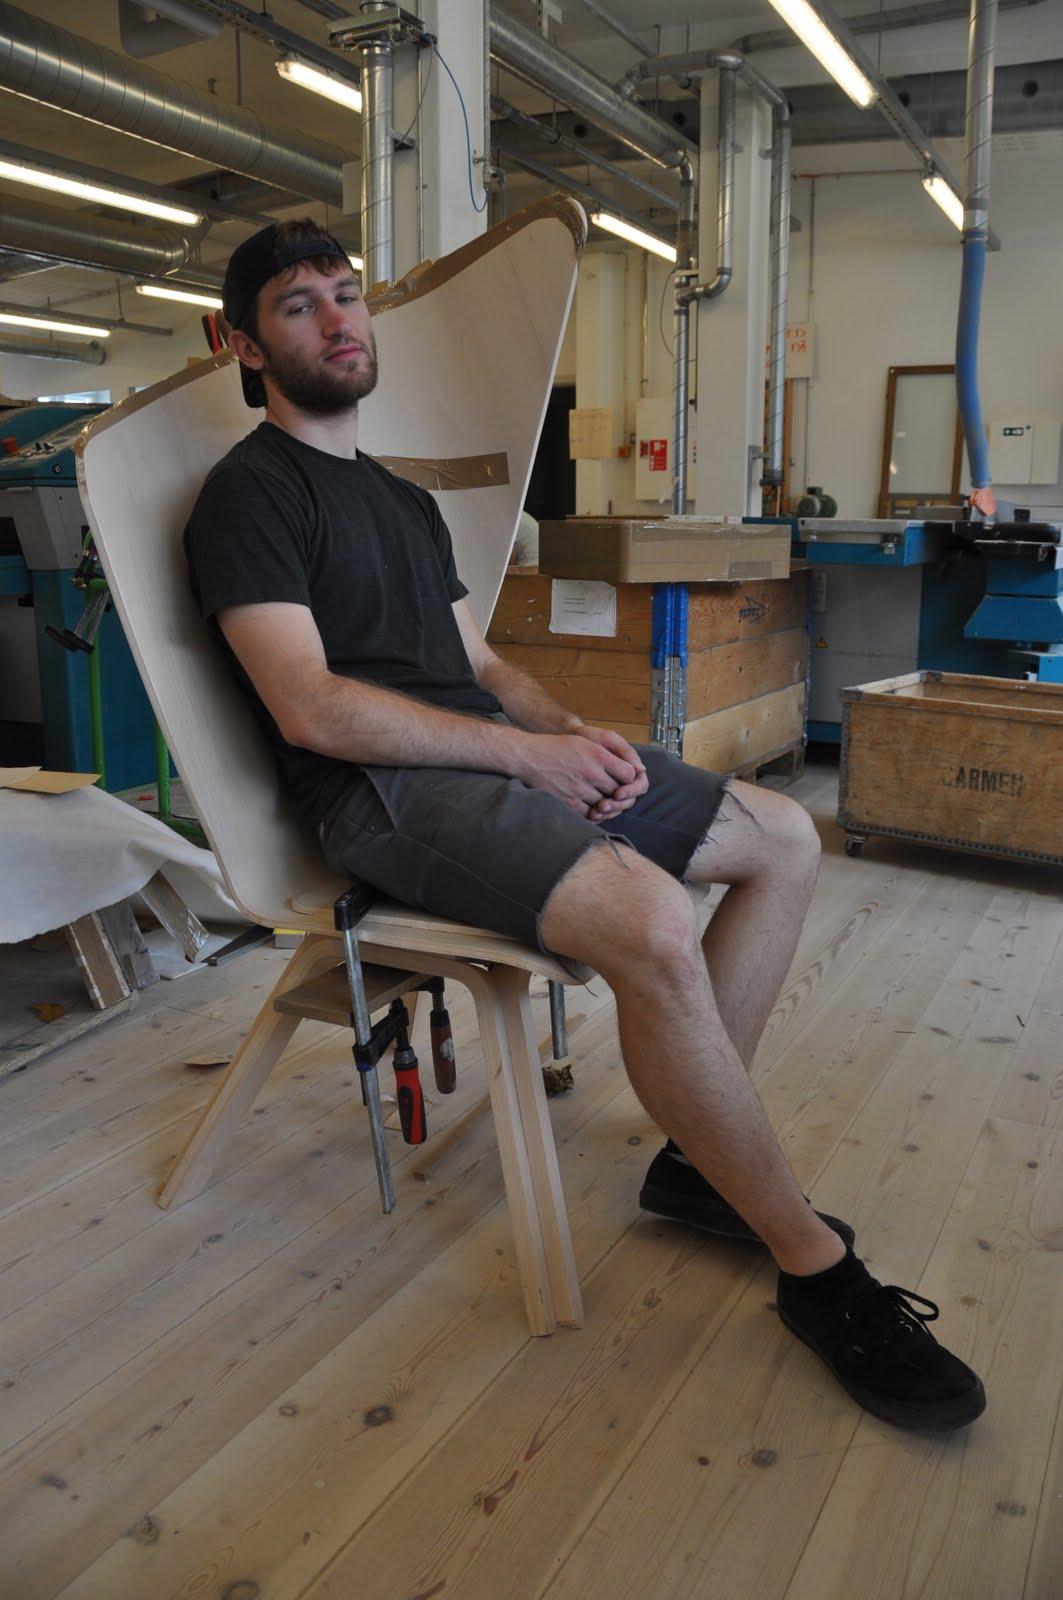 Brunette in Scandinavia People sitting in chairs